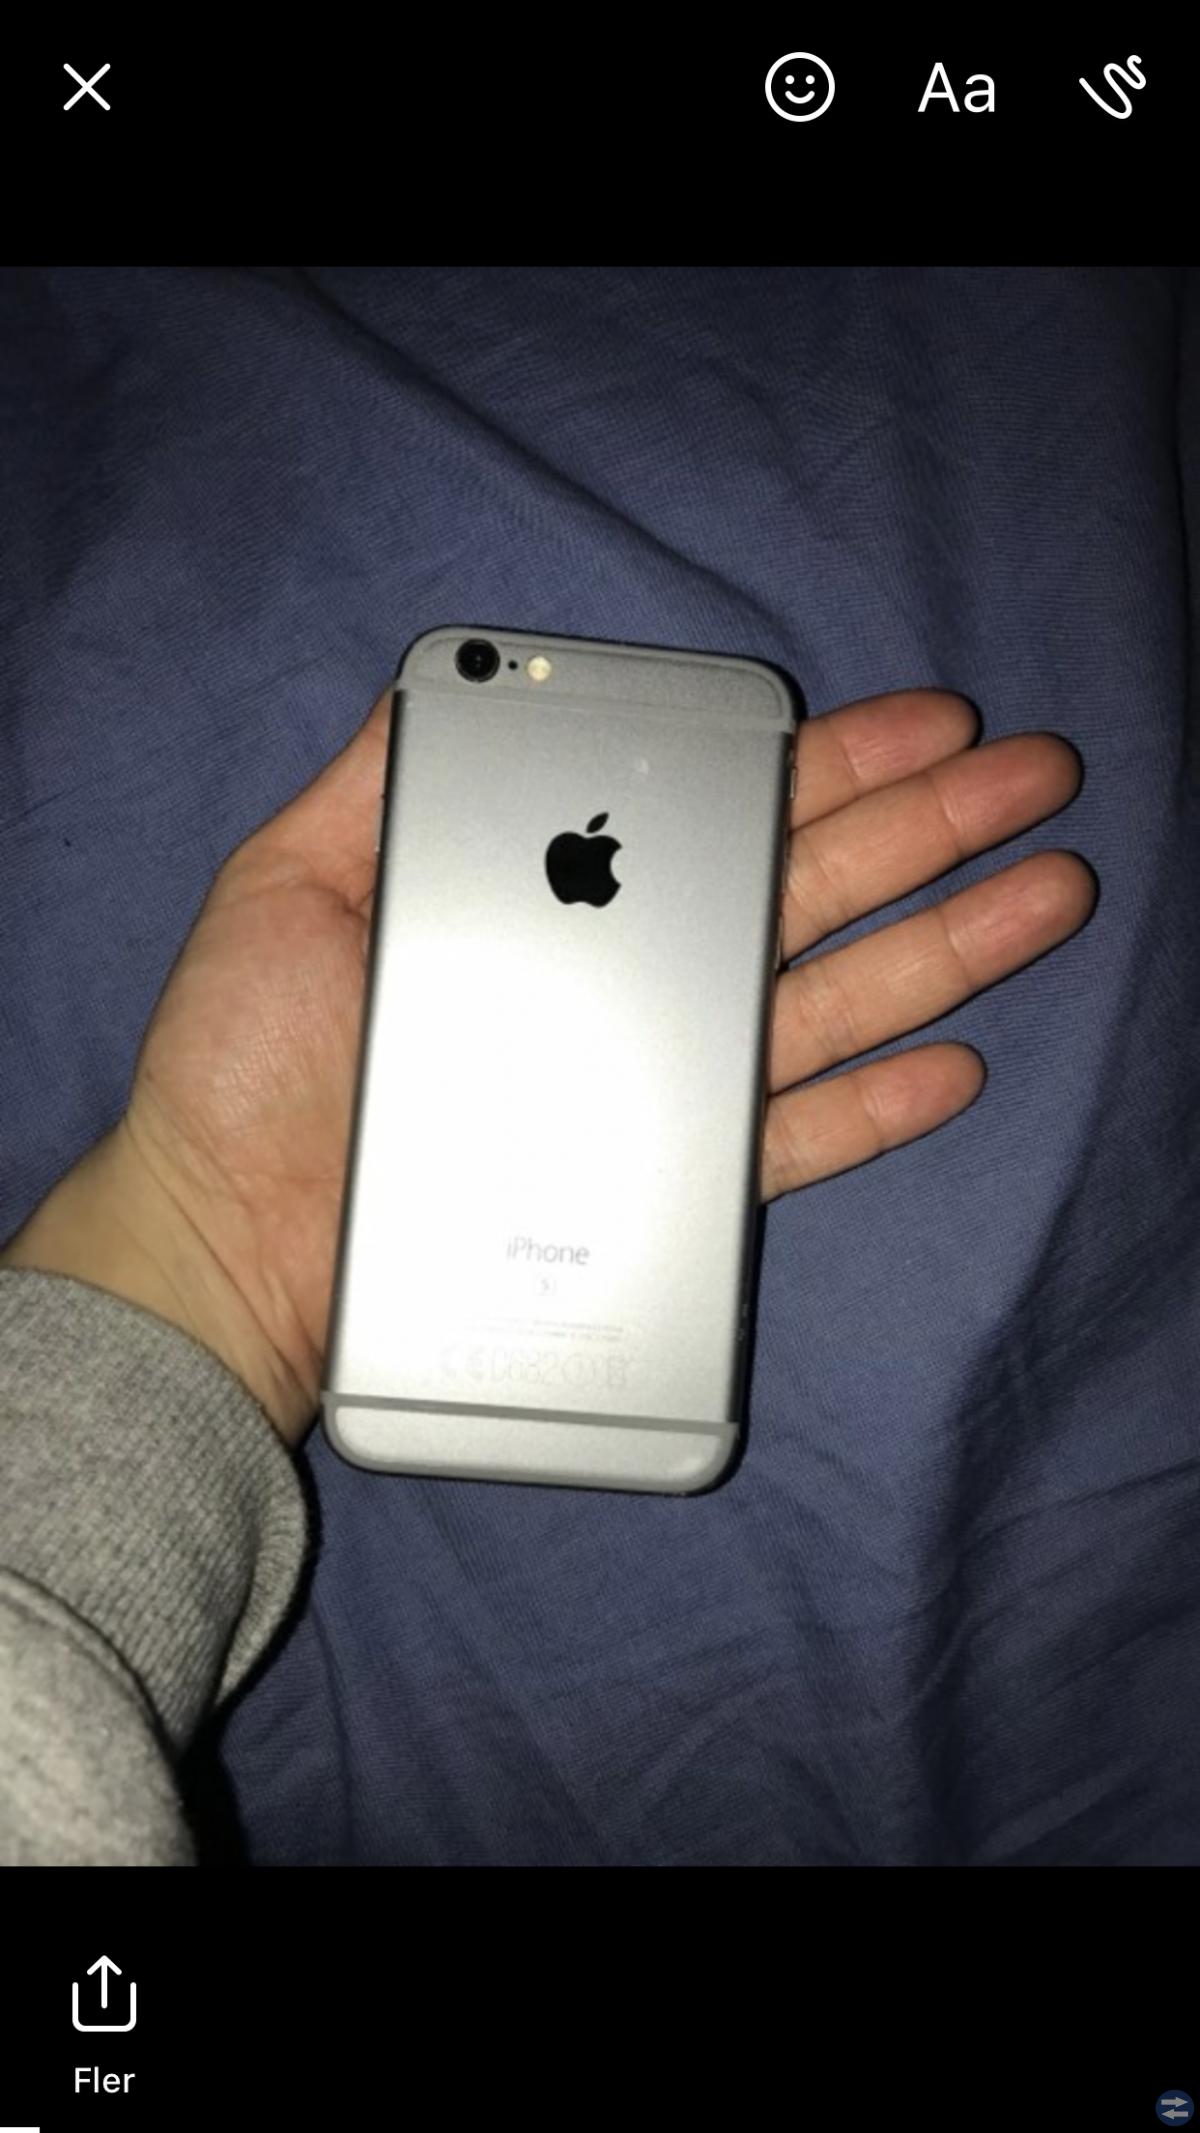 IPhone 6S framsida svart baksida grå + laddare